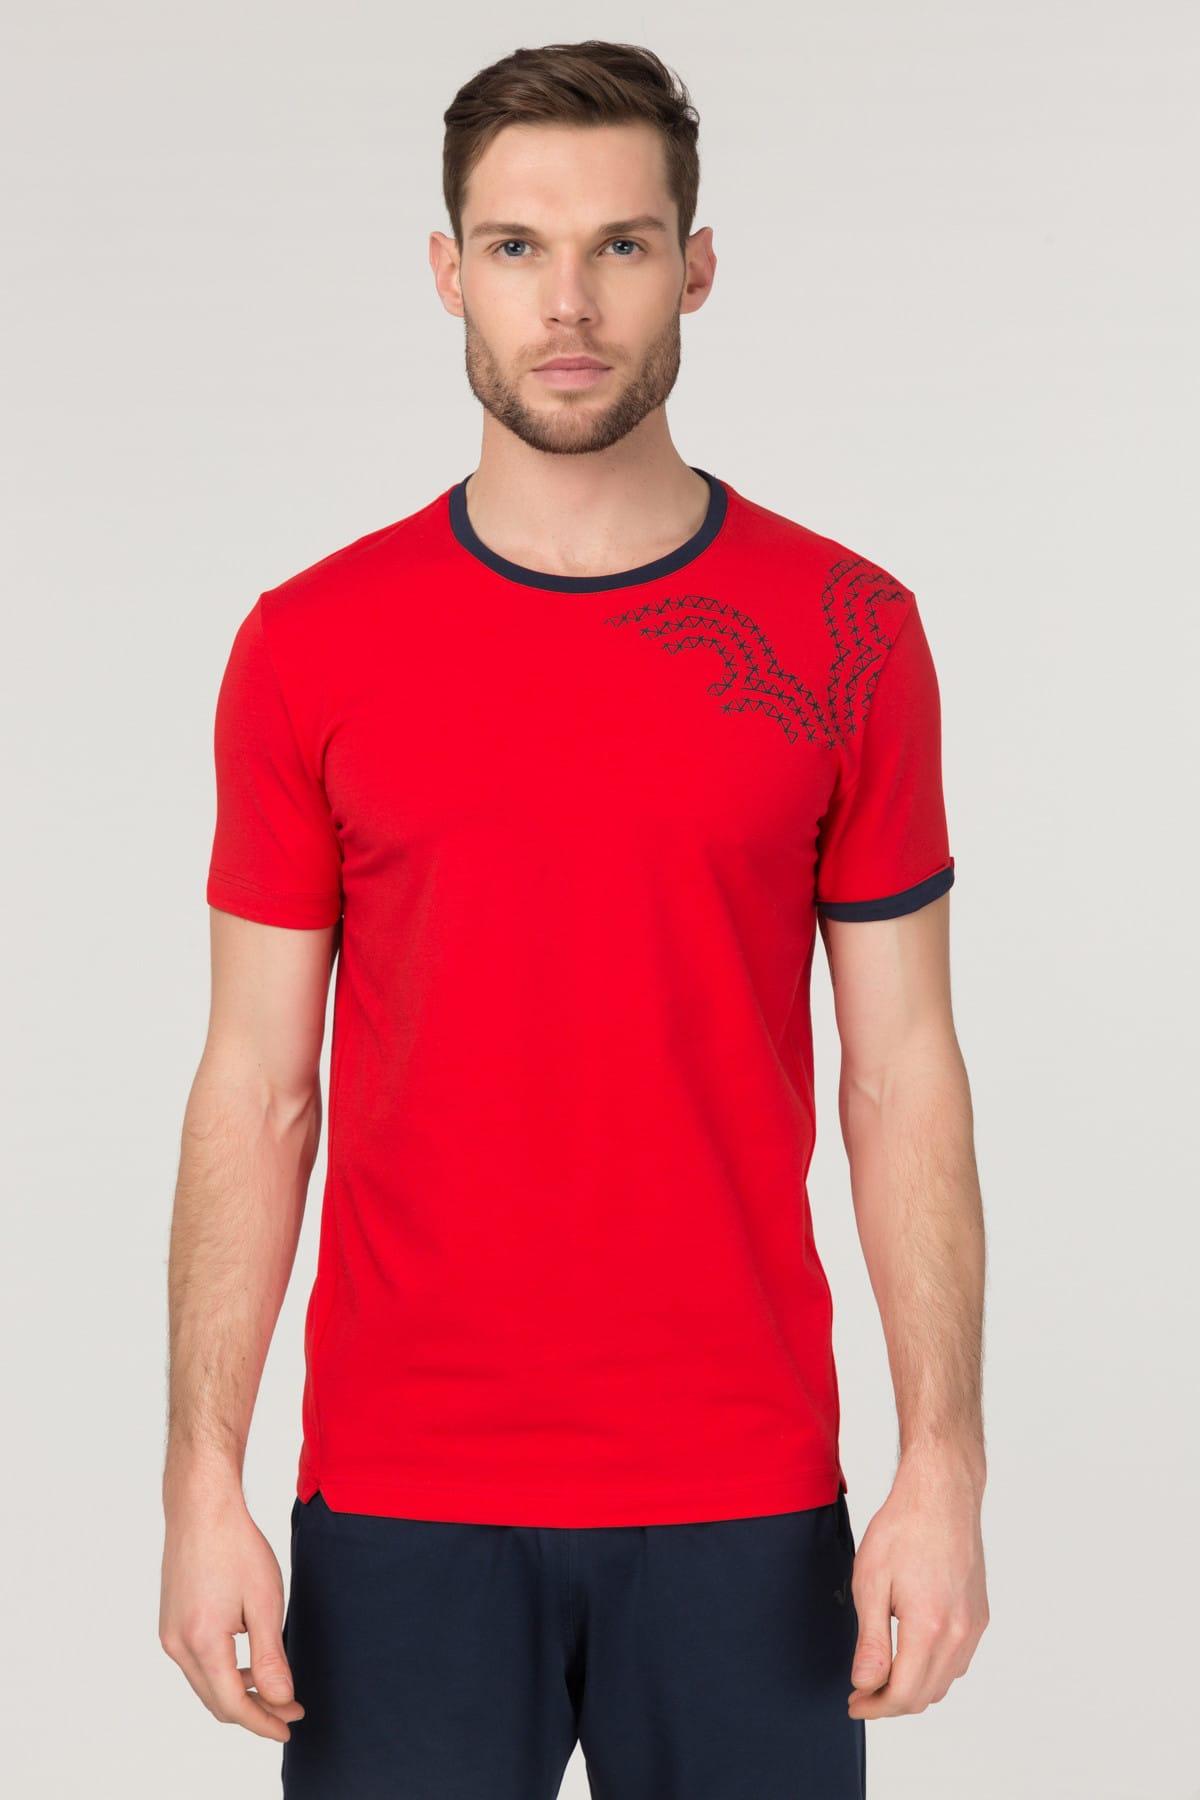 bilcee Kırmızı Pamuklu Erkek T-Shirt FS-1630 1